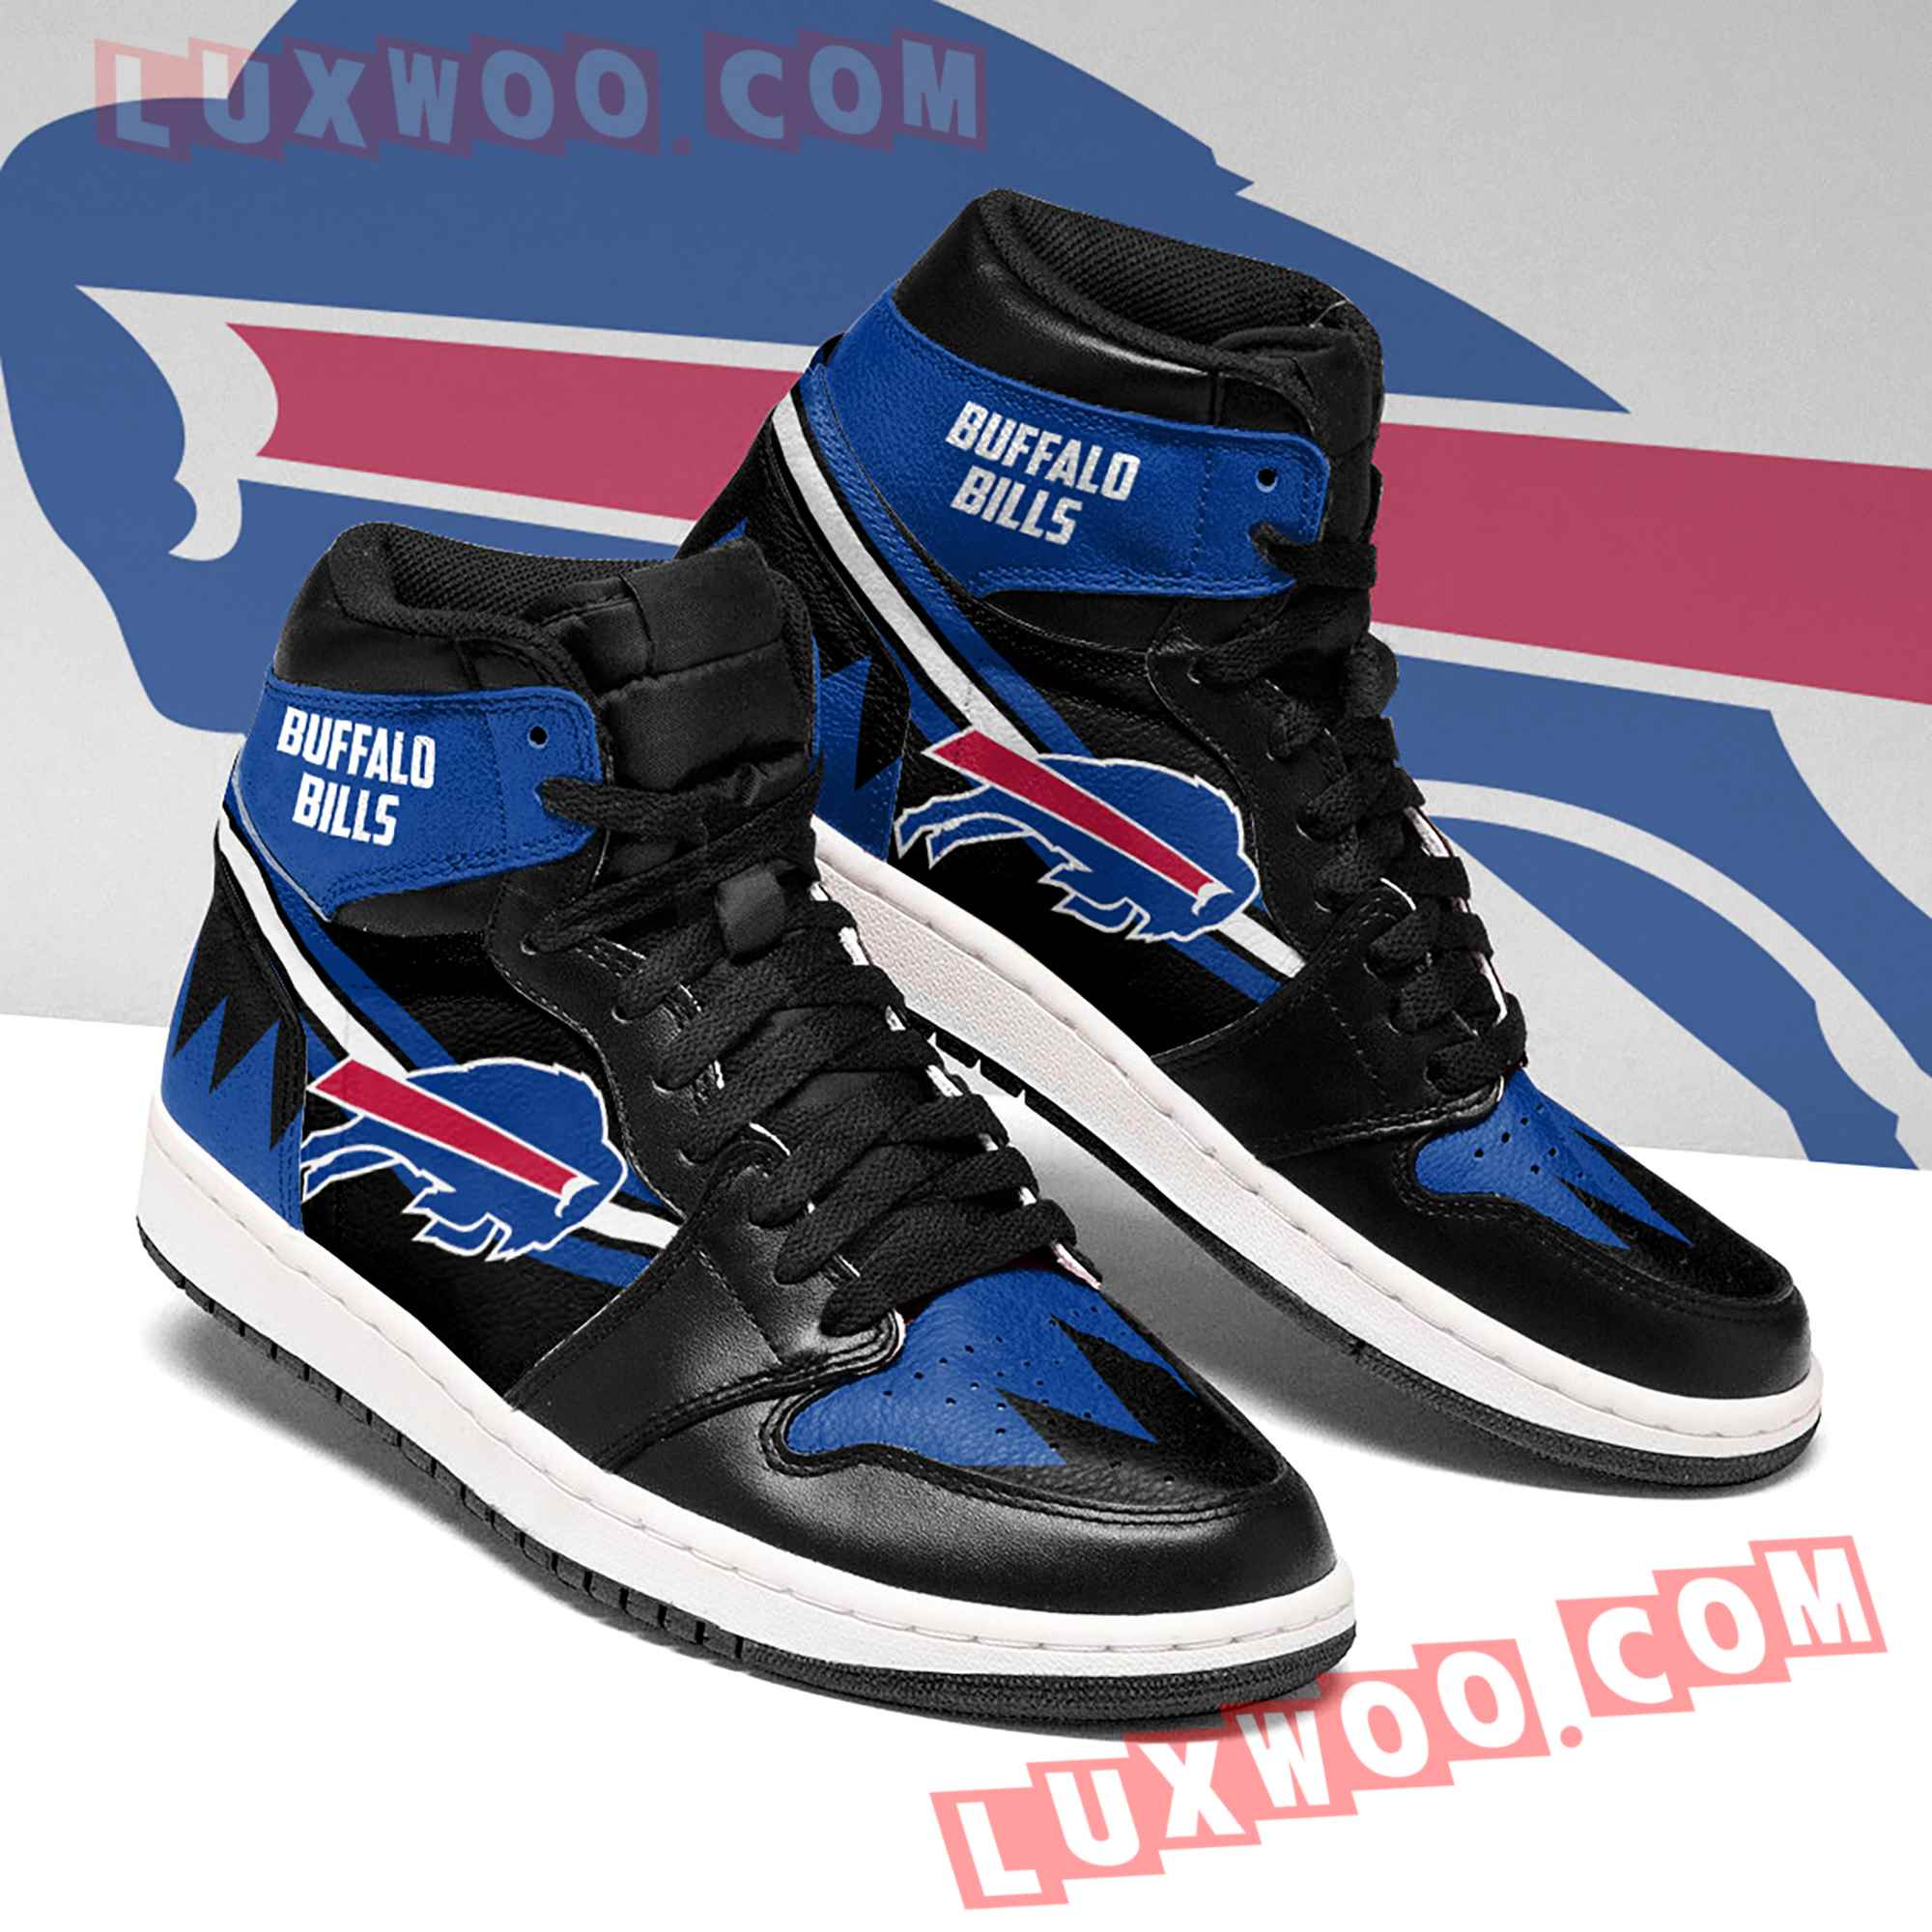 Buffalo Bills Nfl Air Jordan 1 Custom Shoes Sneaker V4